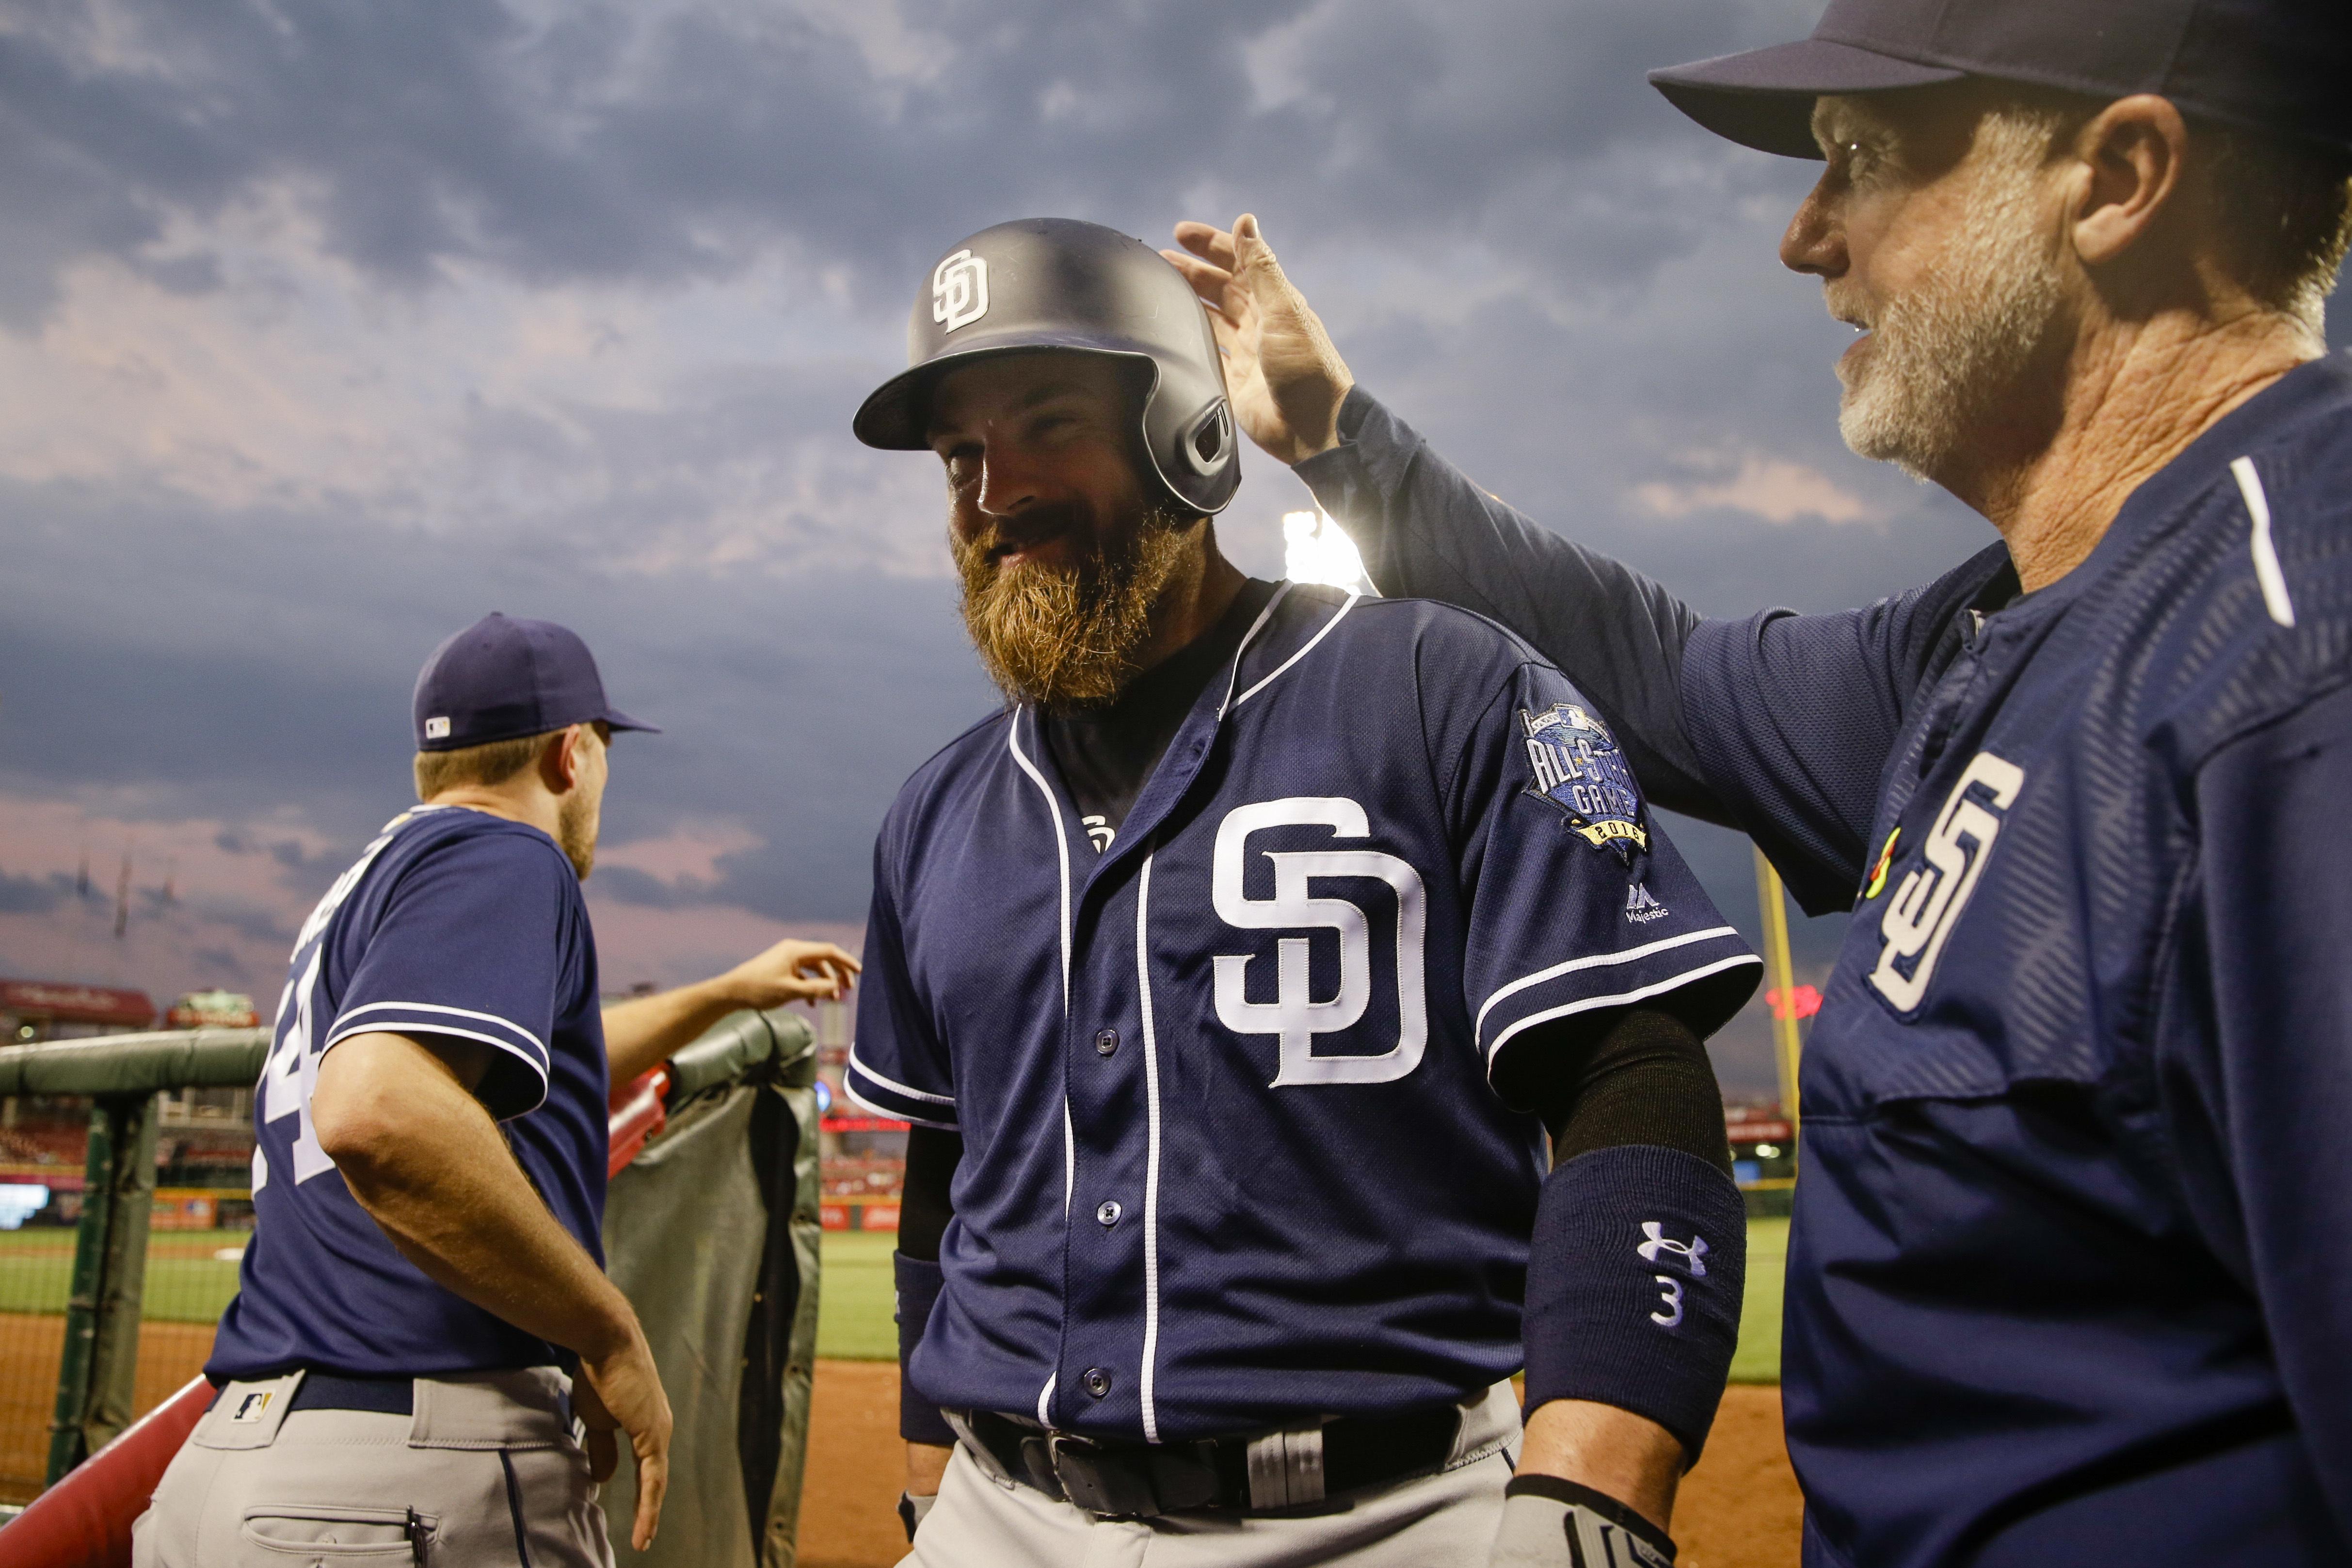 Padres_reds_baseball